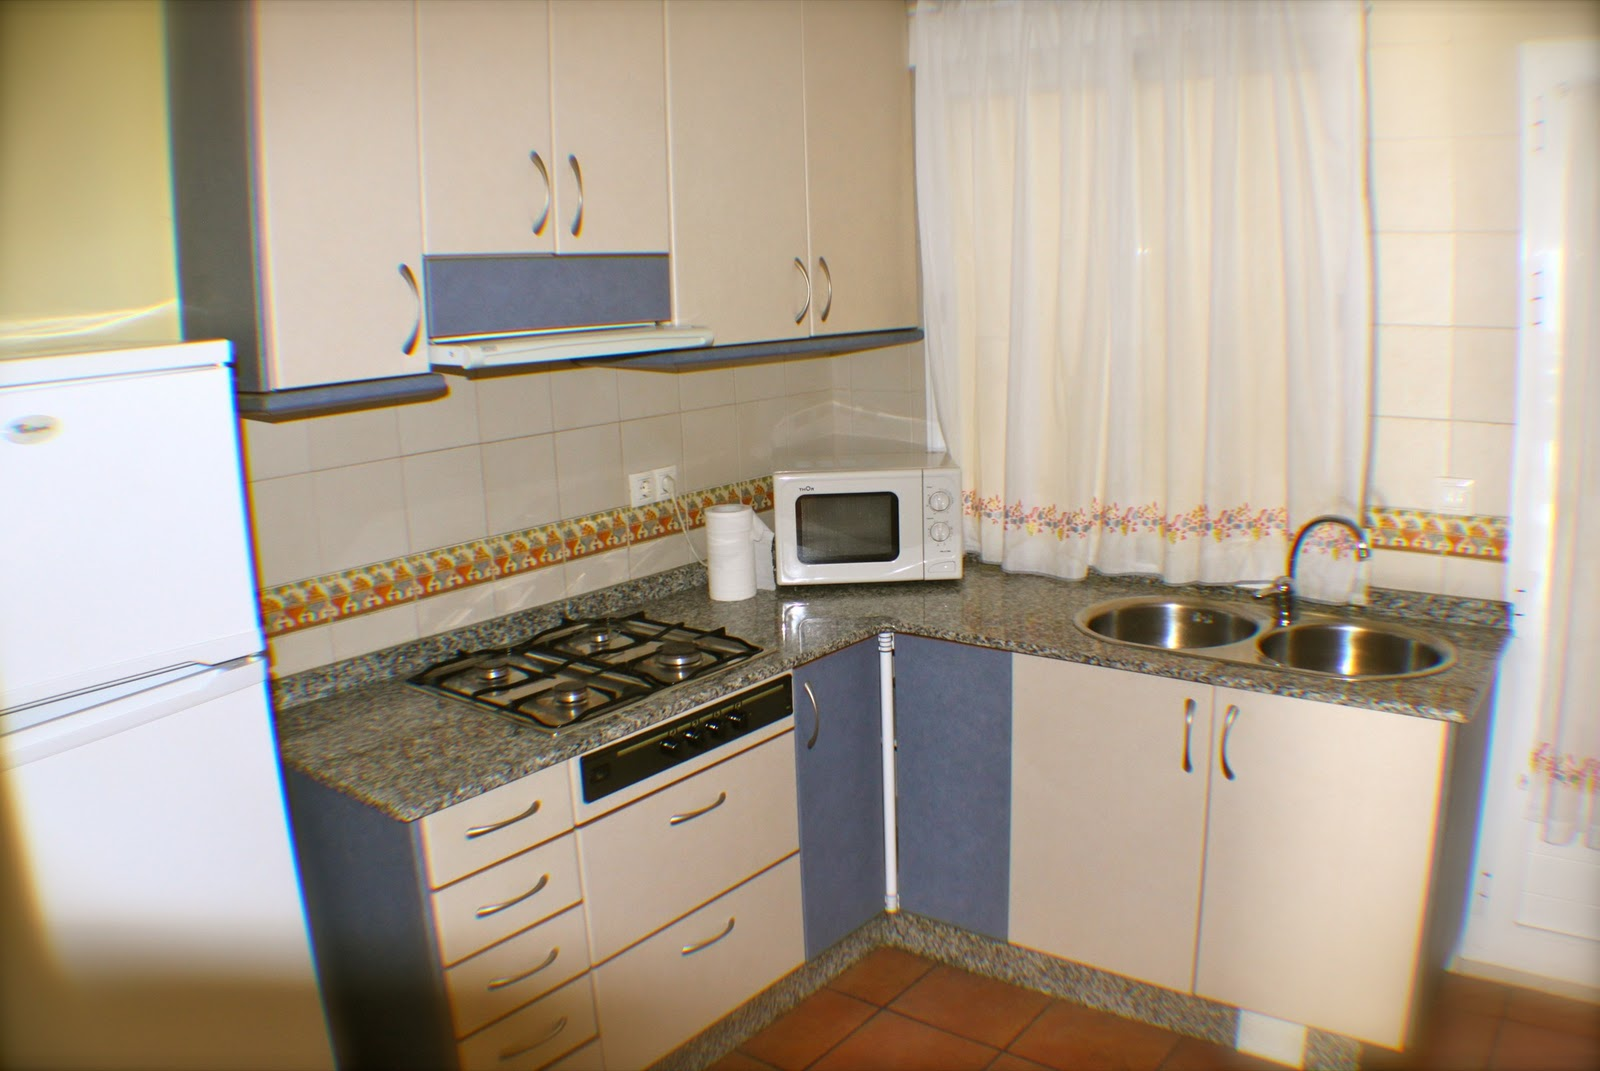 Casas rurales albacete vegasierra for Cocinas rurales